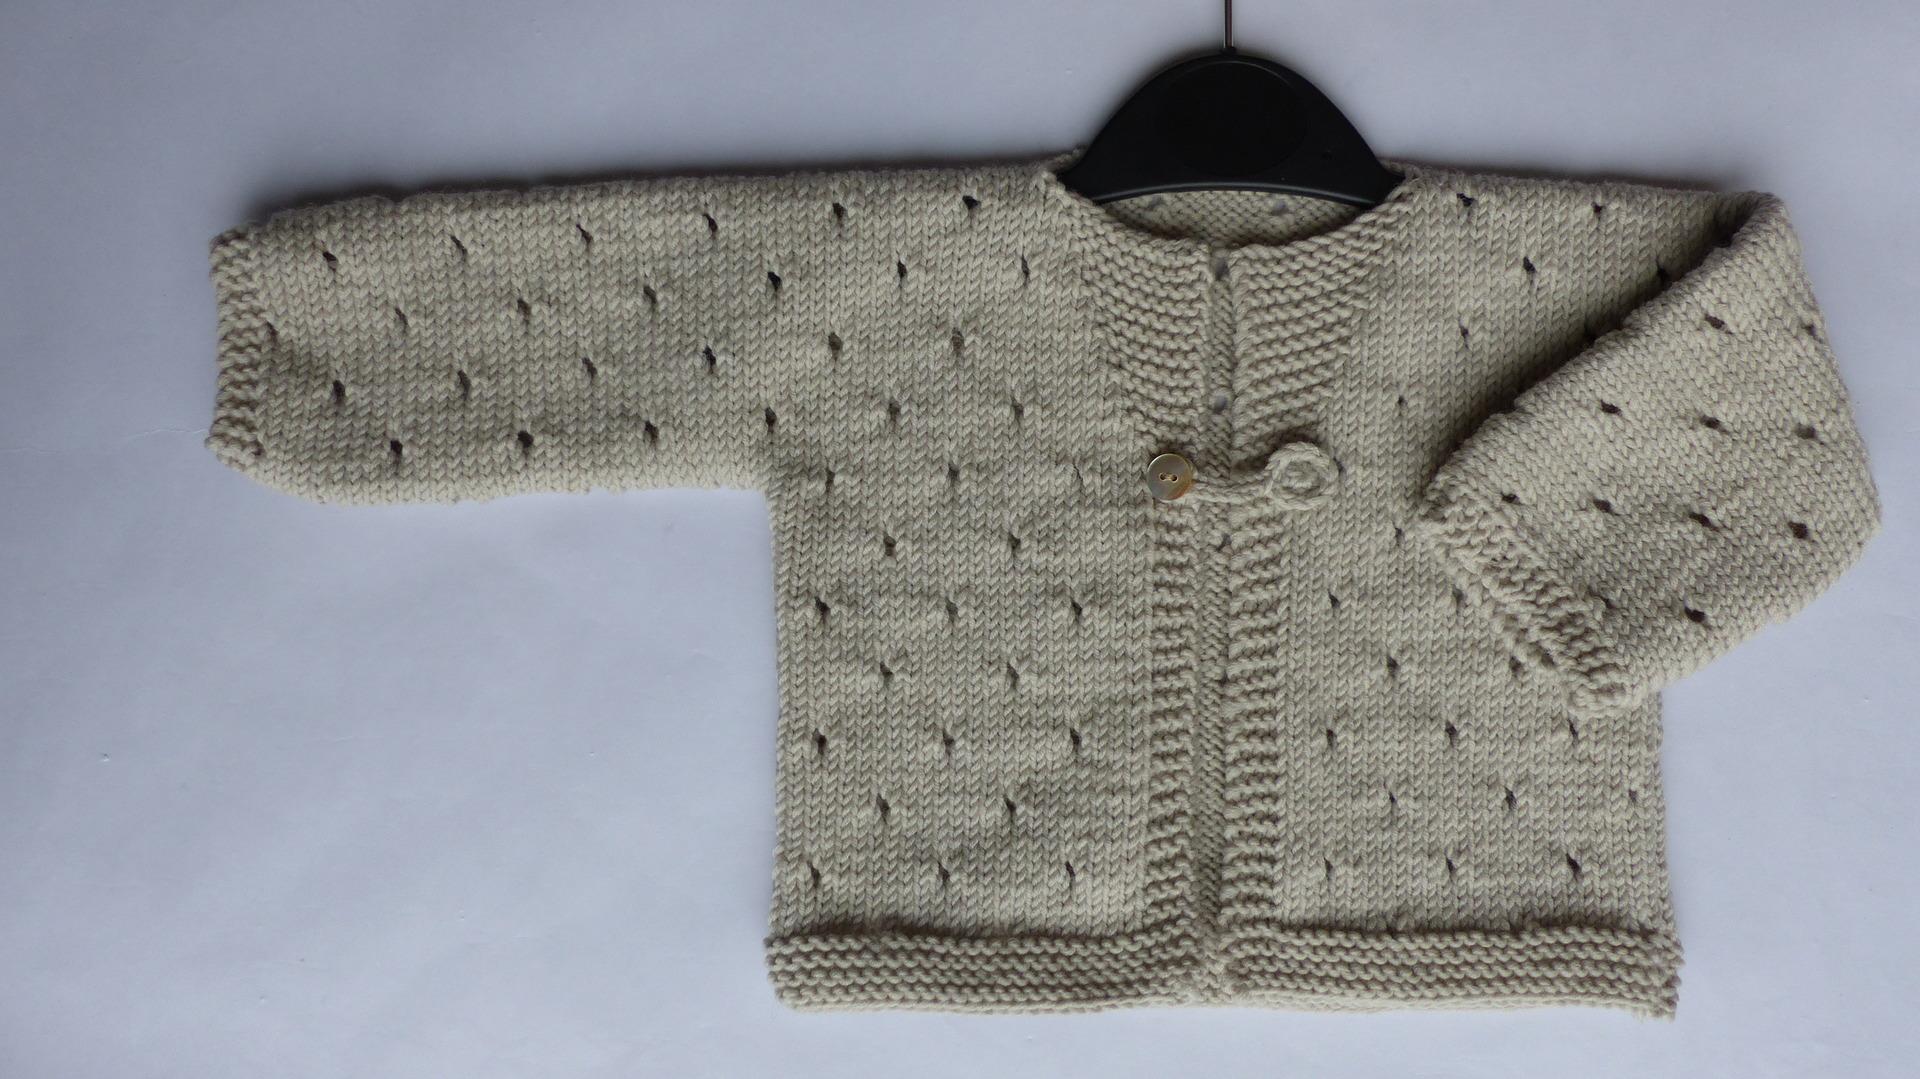 54a7fa3795e99 Tricot gilet kimono bebe - Chapka